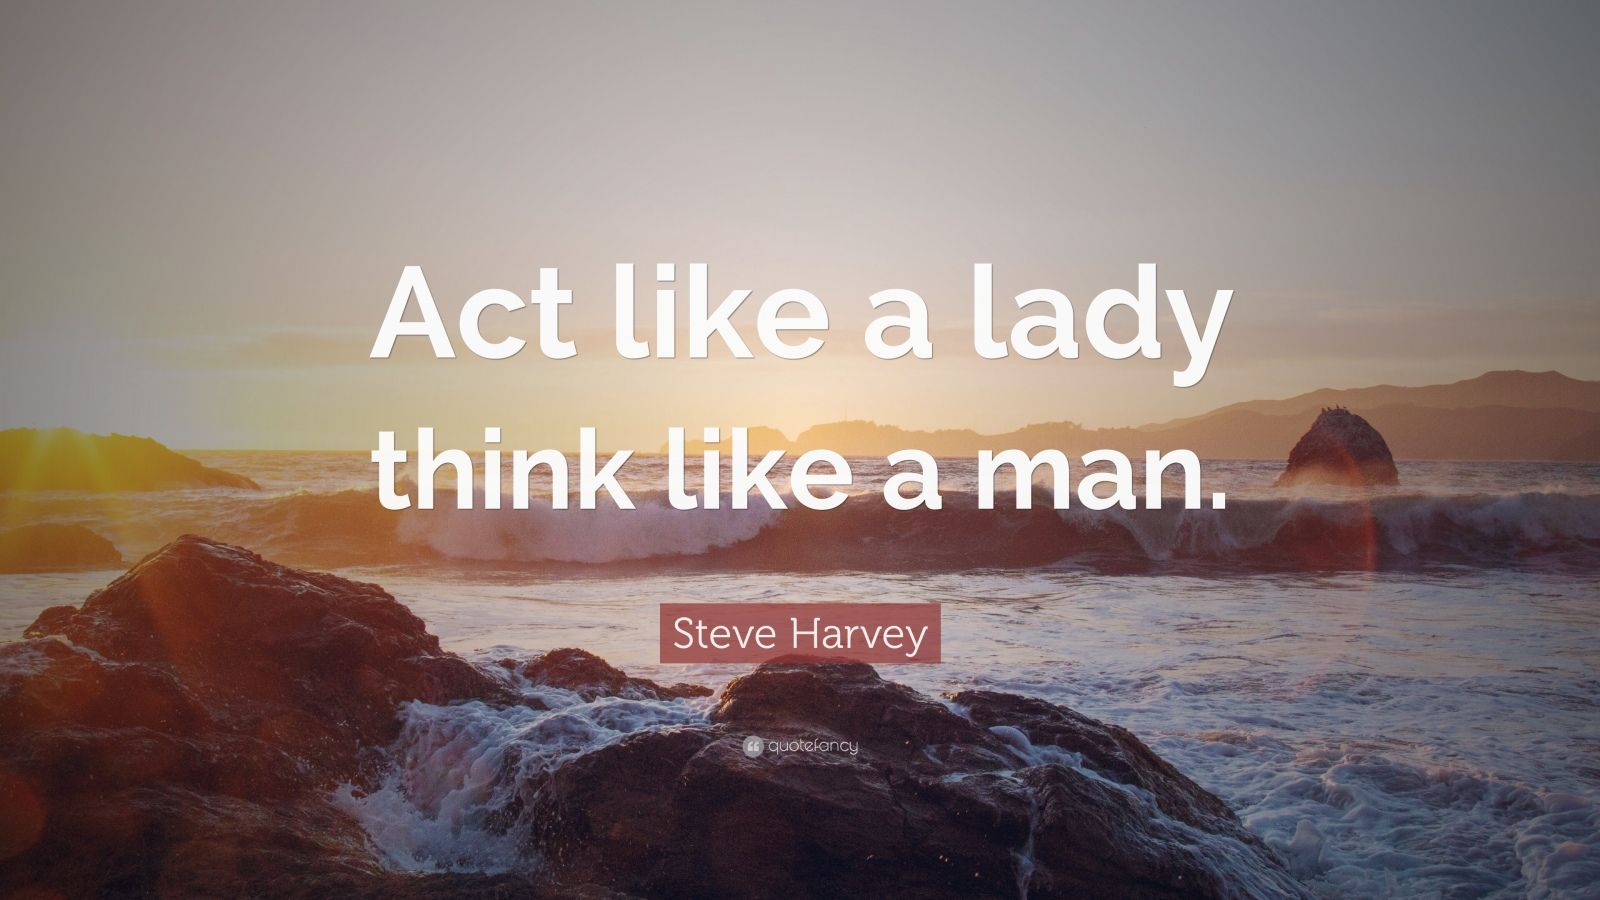 Steve Harvey Quotes 97 Wallpapers Quotefancy